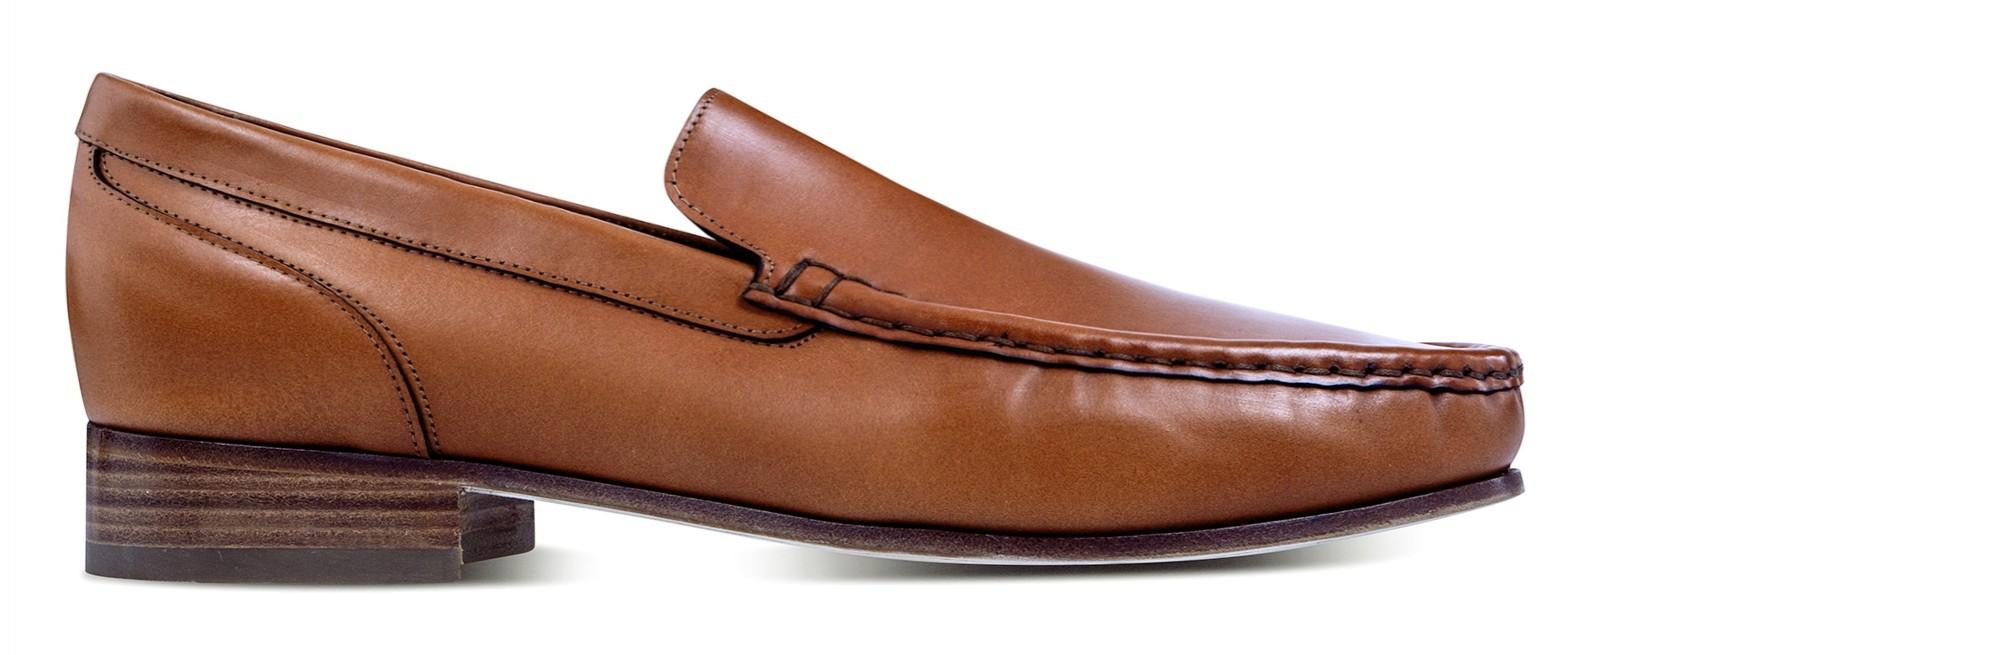 Cobres elevator shoes